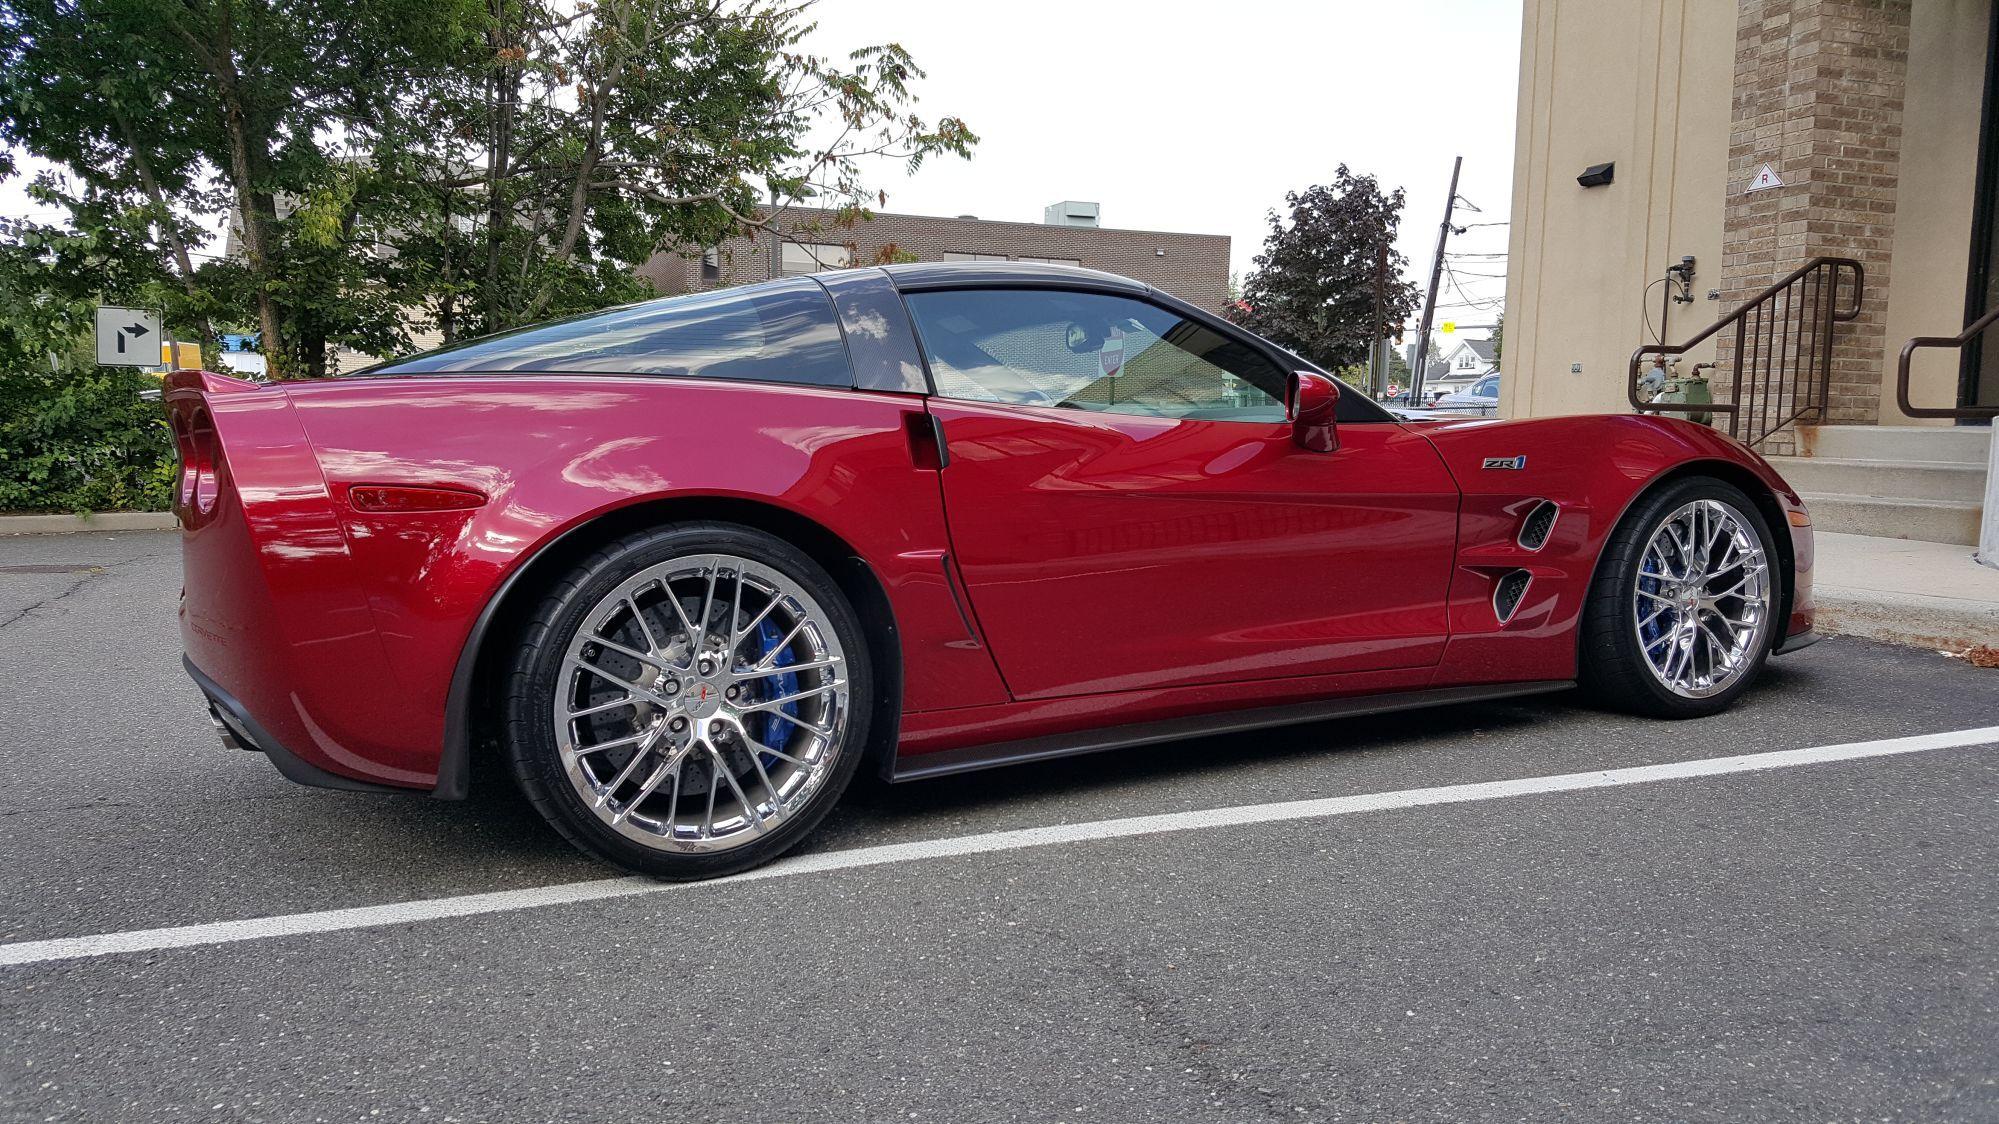 Crystal Red Color Variation Car To Car Corvetteforum Chevrolet Corvette Forum Discussion Corvette Chevrolet Corvette Color Variations